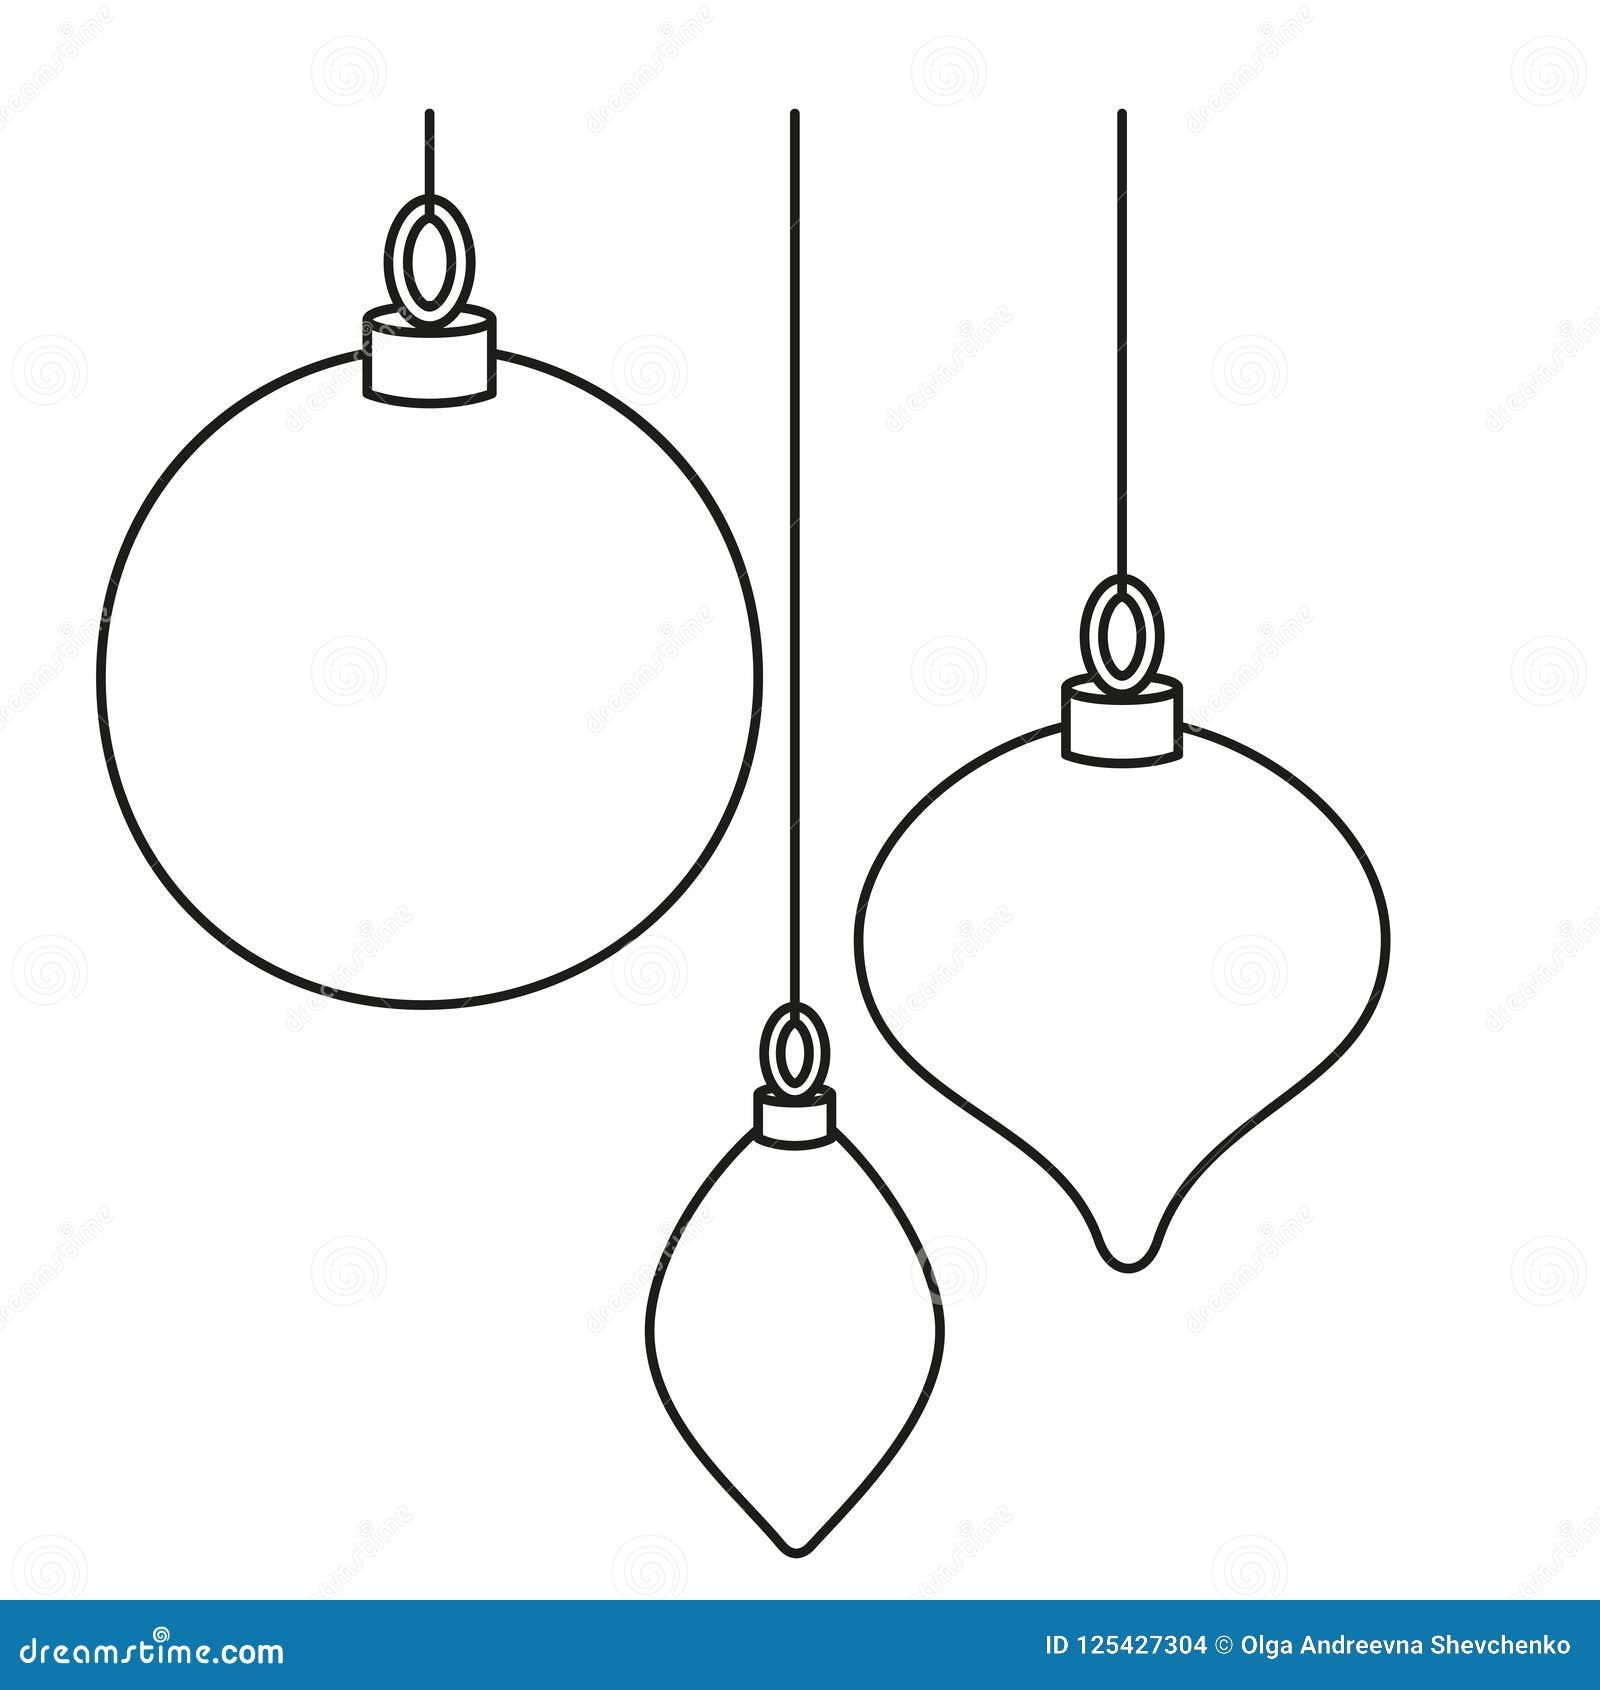 Line Art Black White Christmas Tree Decorations Stock Vector Illustration Of Card Gift 125427304